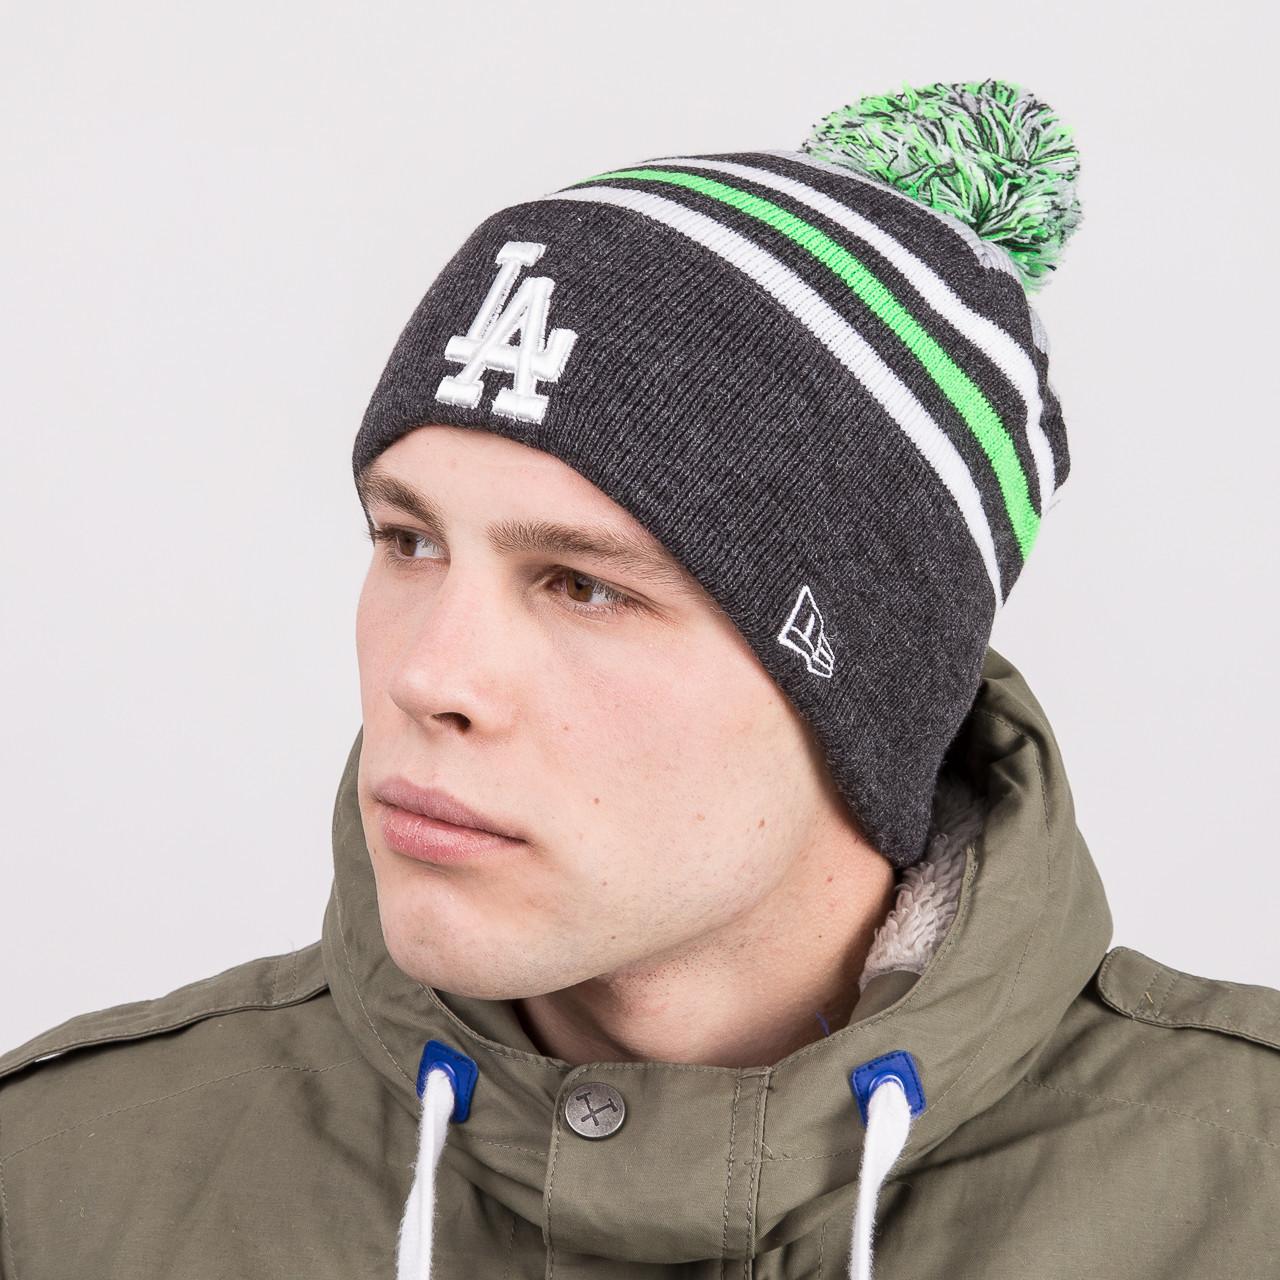 Модная зимняя мужская шапка с помпоном - LOS ANGELES - Артикул 8824